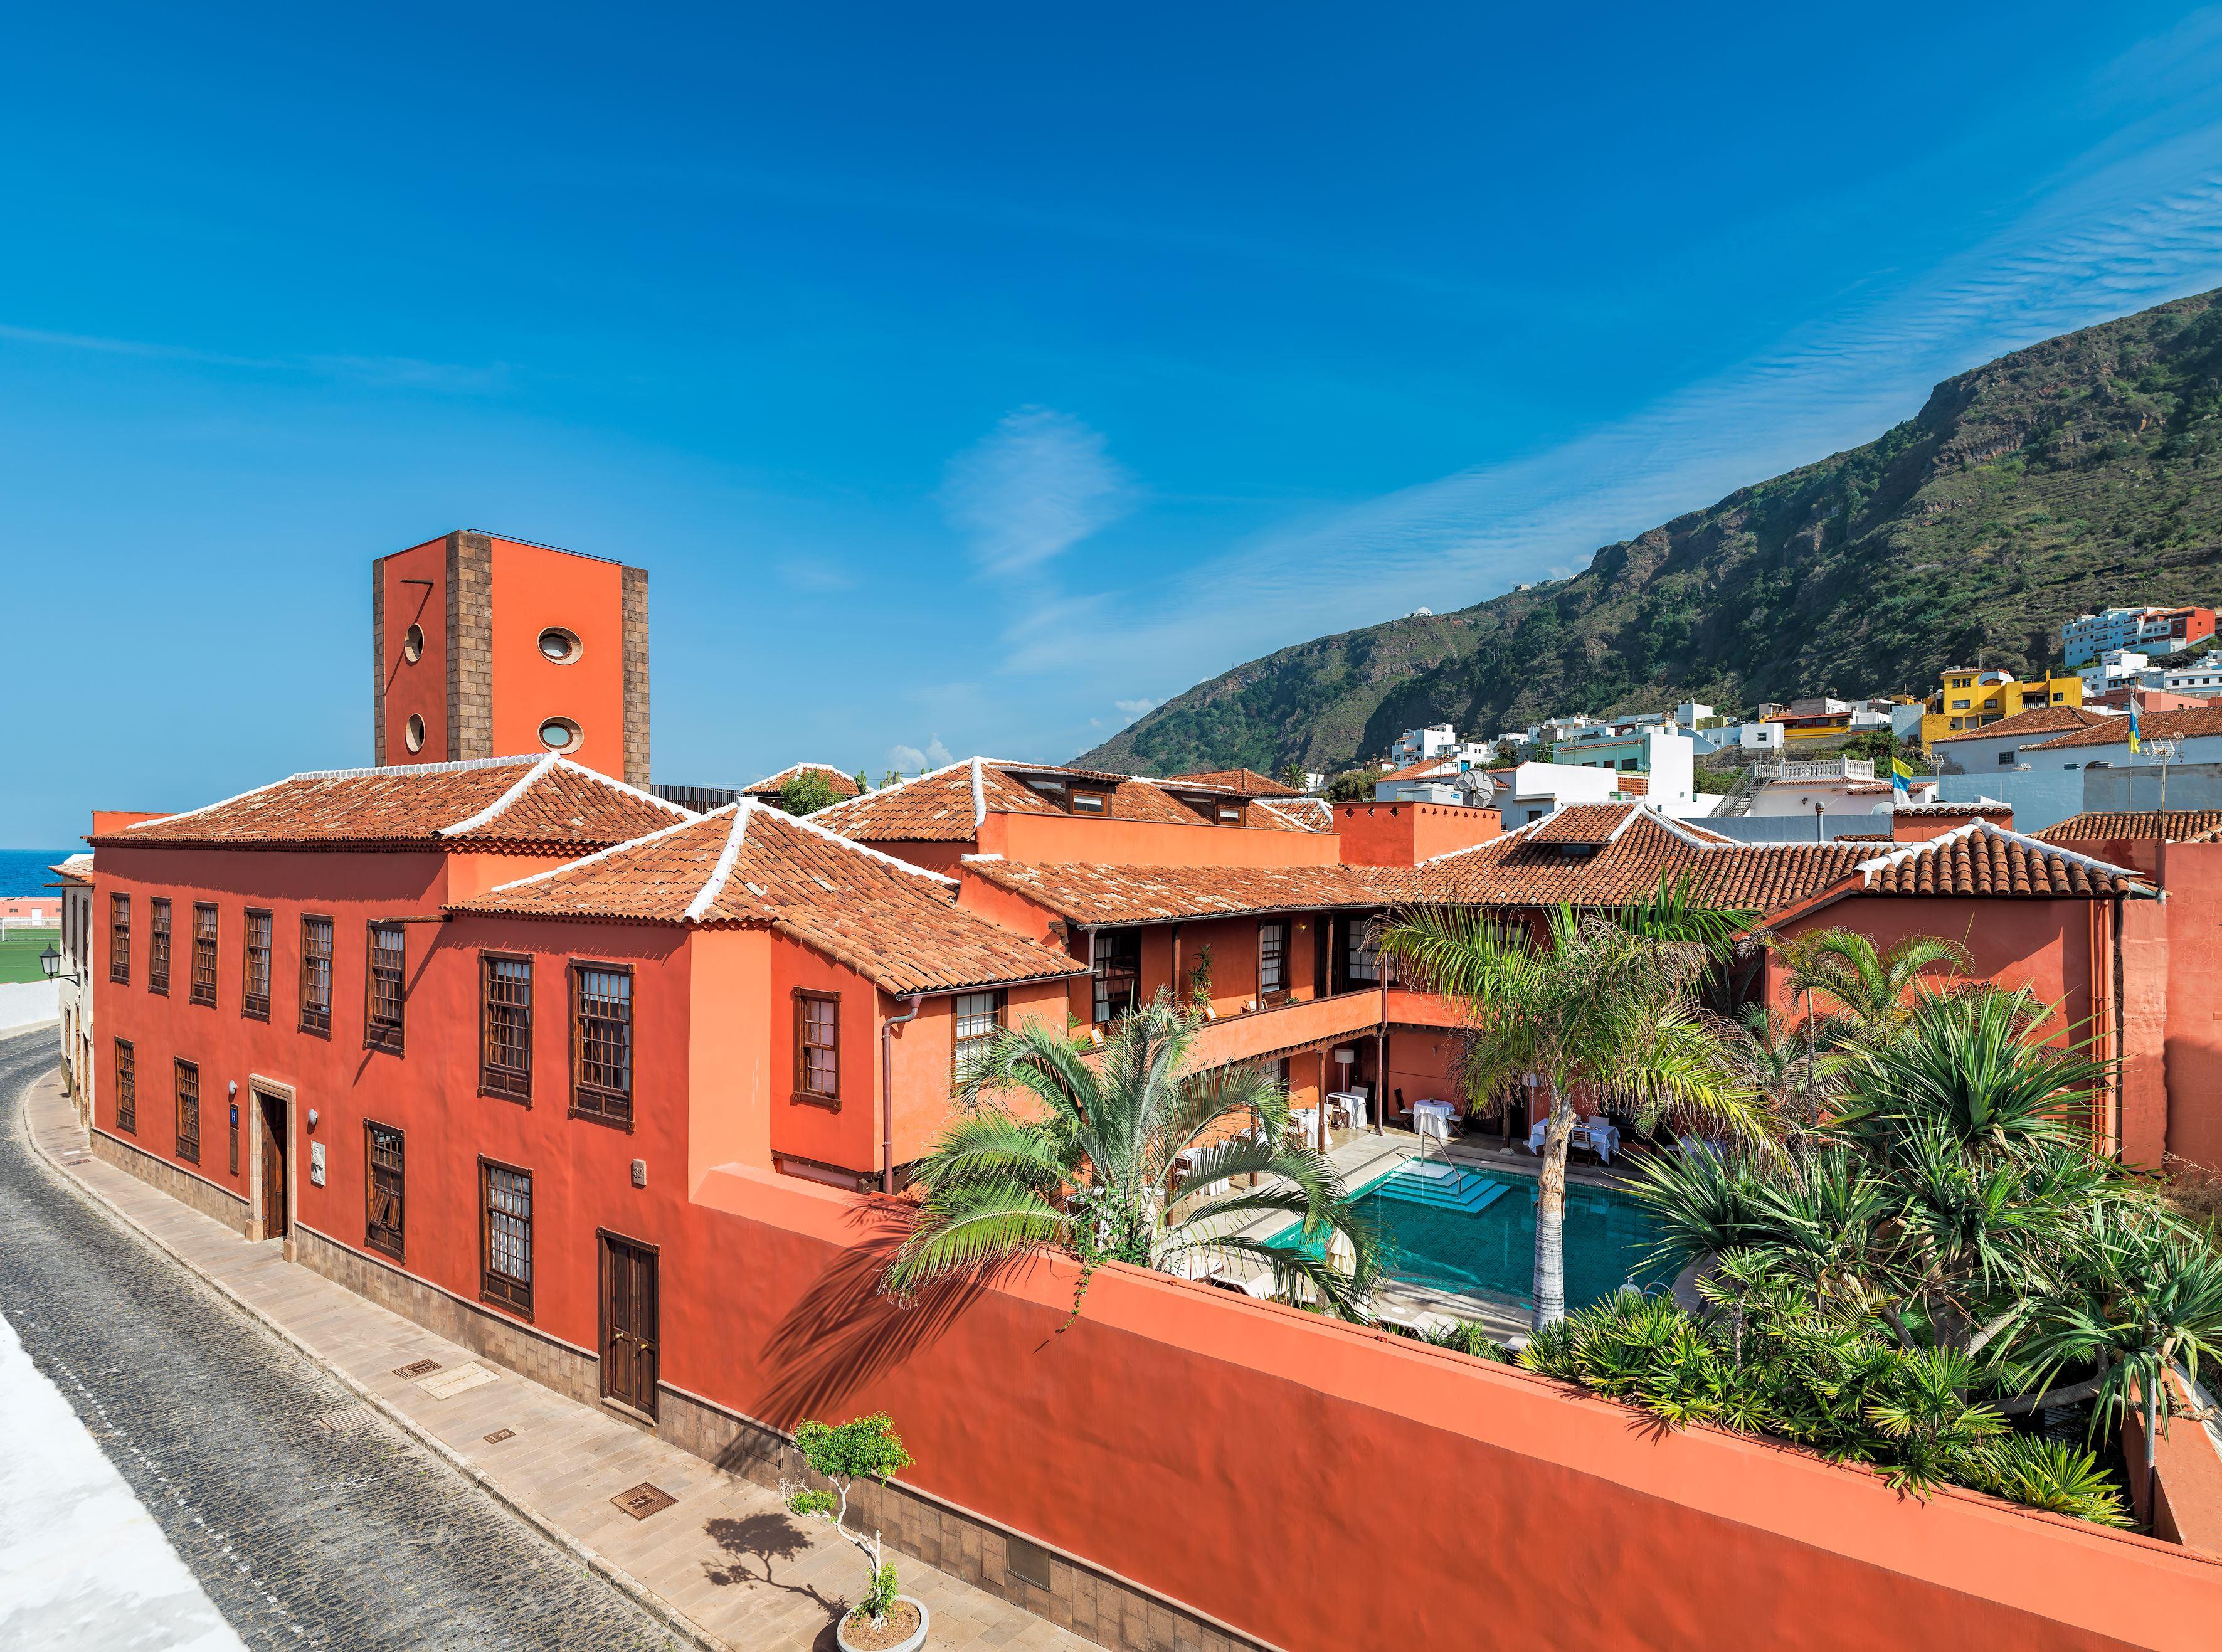 Hotell San Roque, Garachico Teneriffa